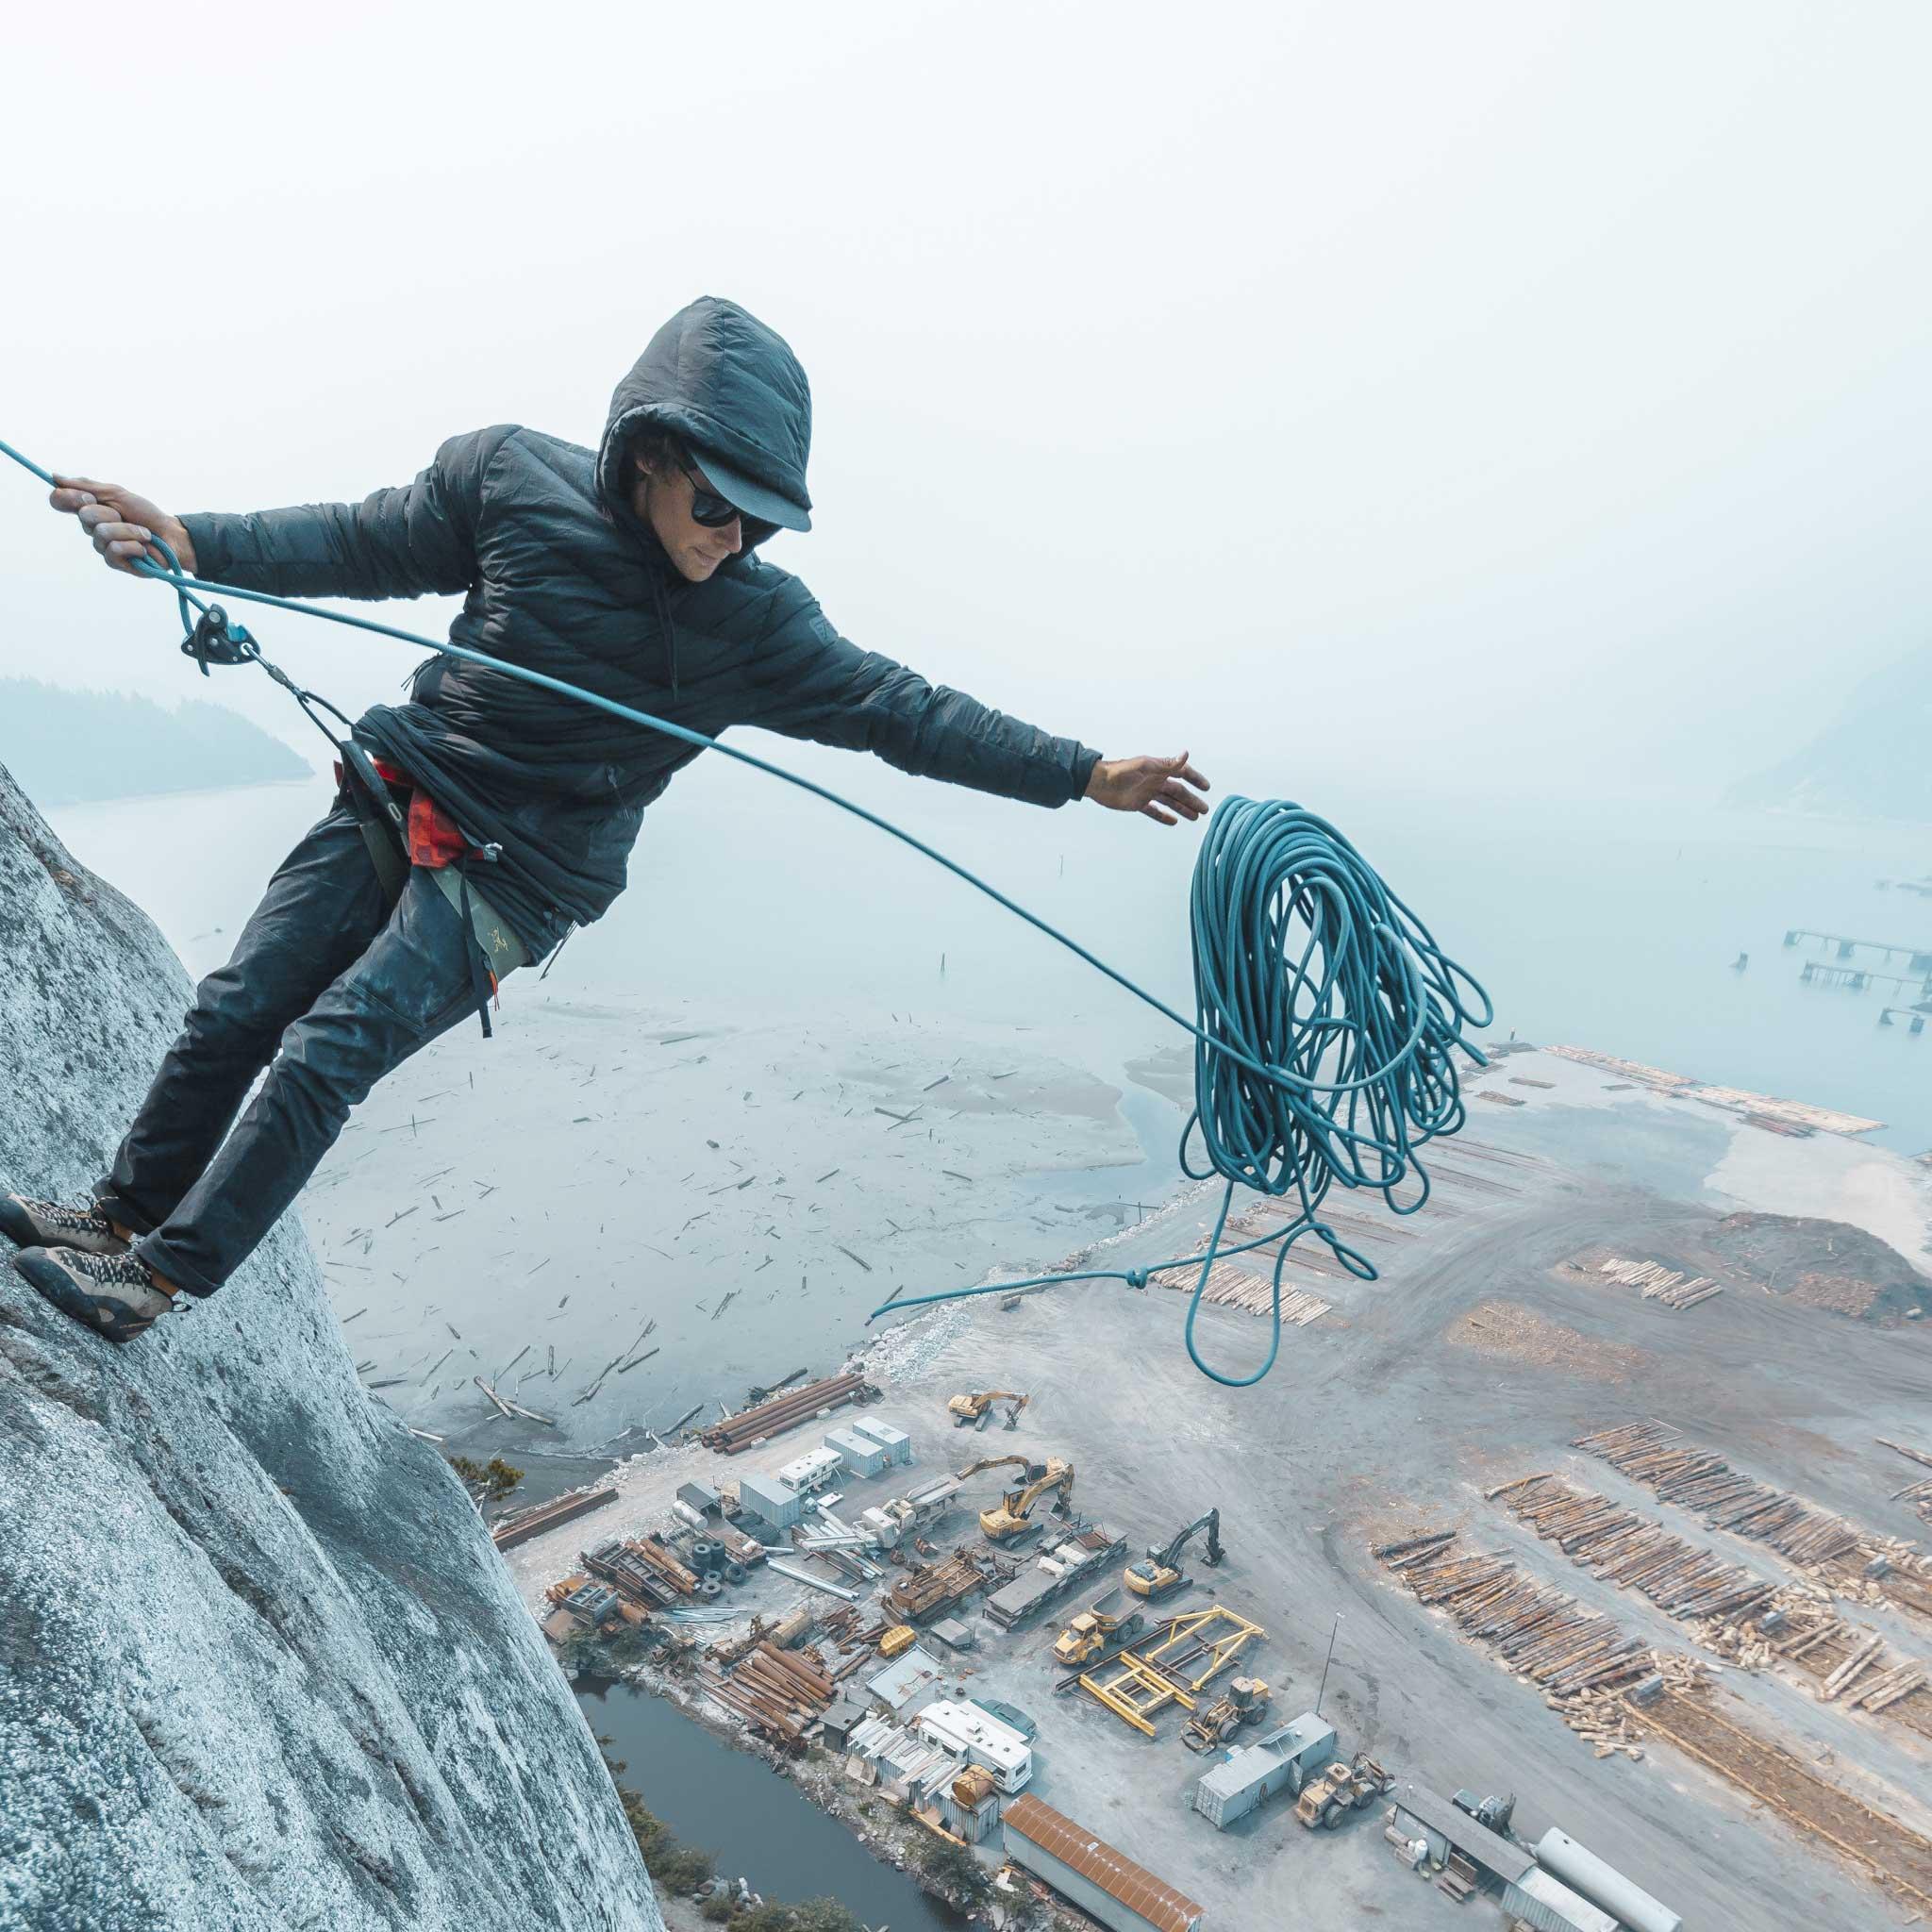 Man rock climbing while wearing Robson Down Hoody